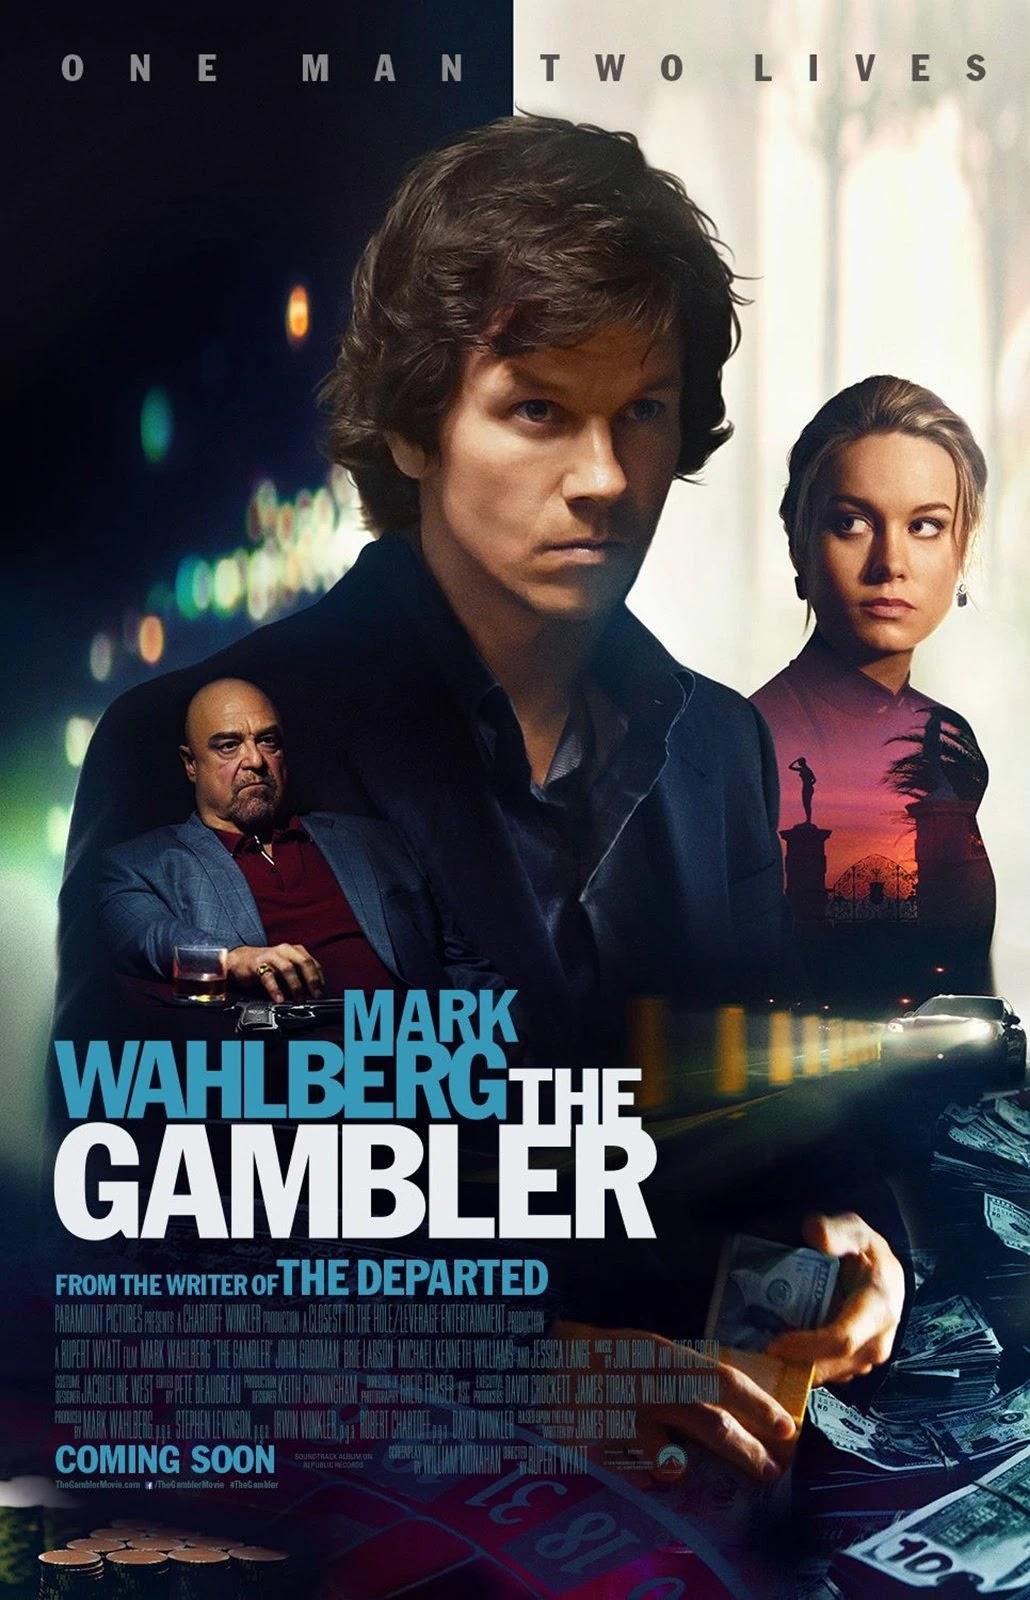 the gambler,玩命賭徒,赌棍